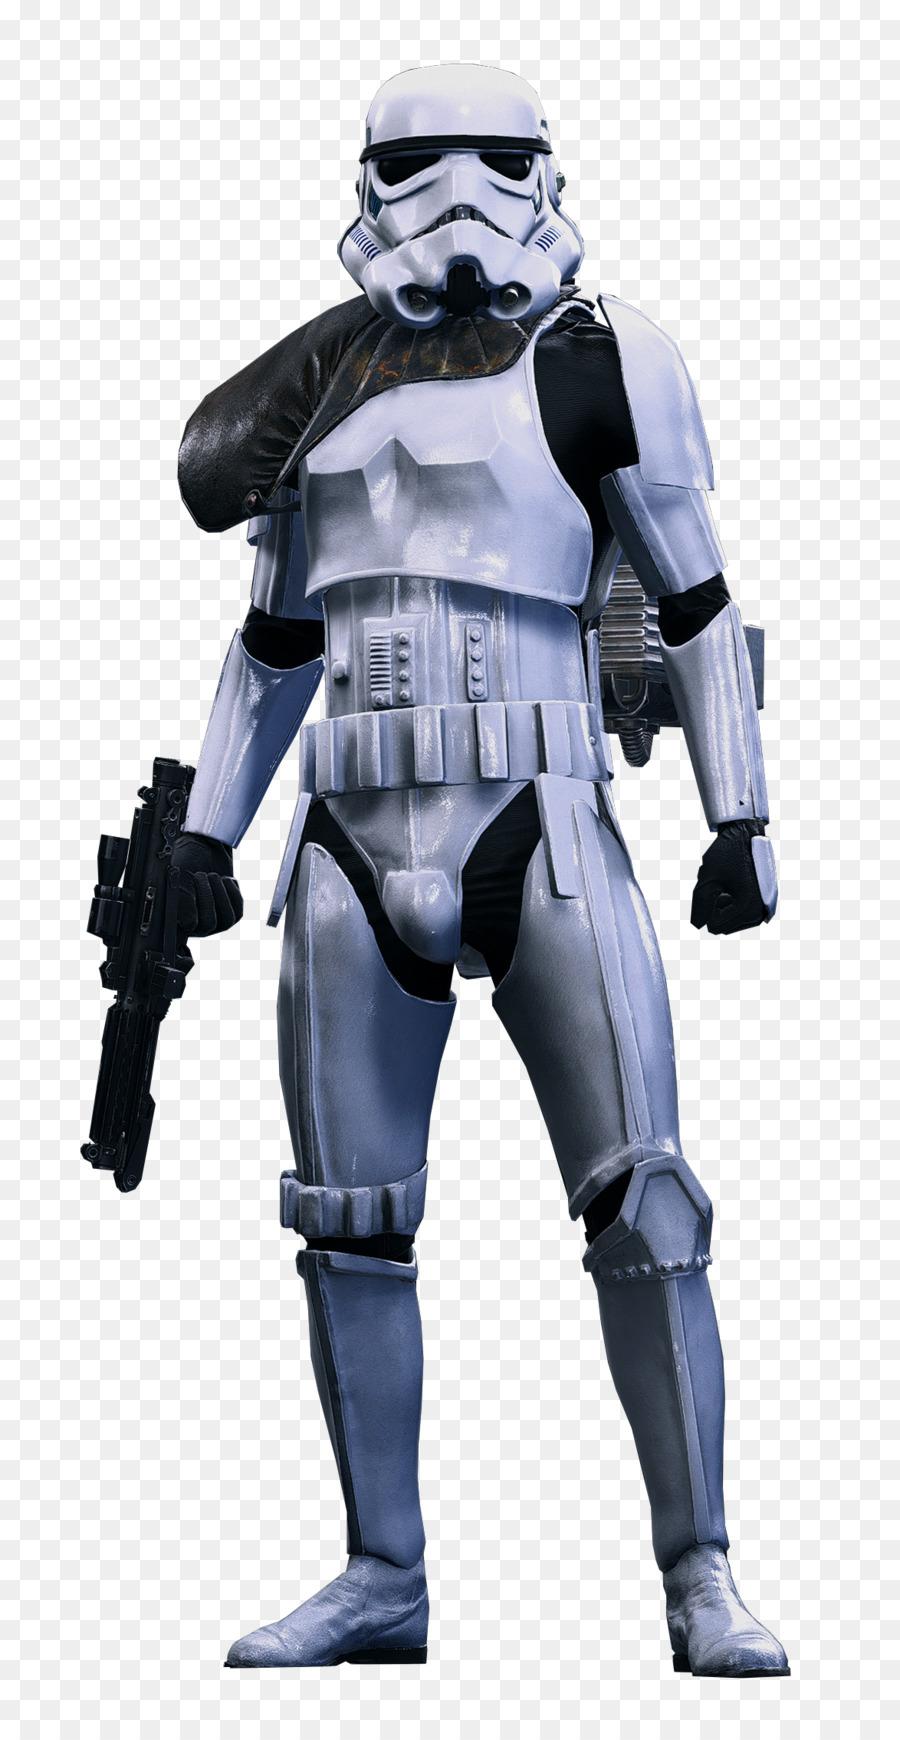 Star Wars Battlefront Ii Toy Boba Fett Star Wars Battlefront Star Wars